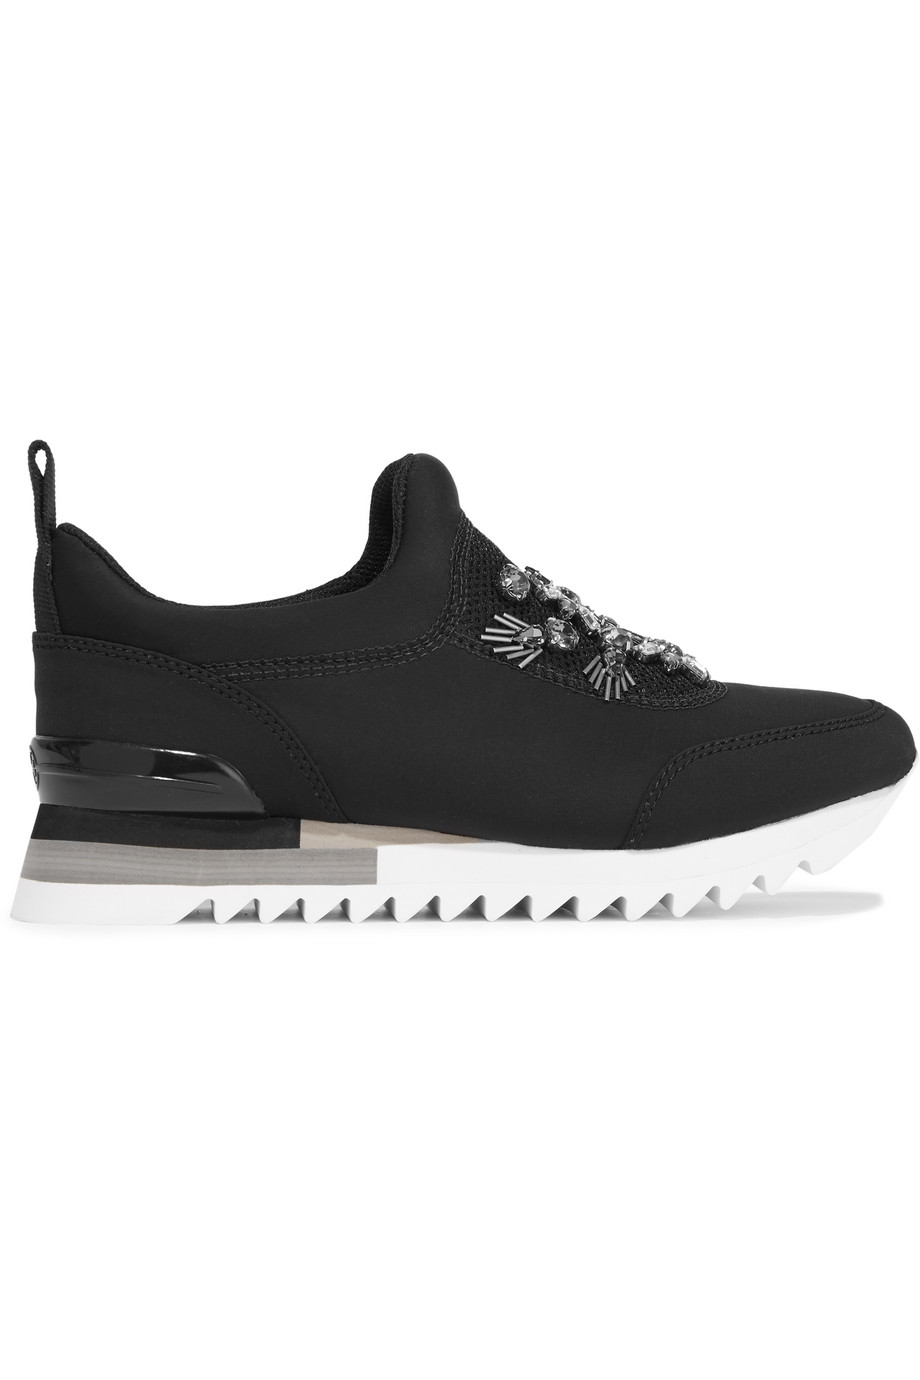 Tory Burch Rosas Embellished Mesh-Paneled Neoprene Slip-on Sneakers, Black, Women's, Size: 5.5